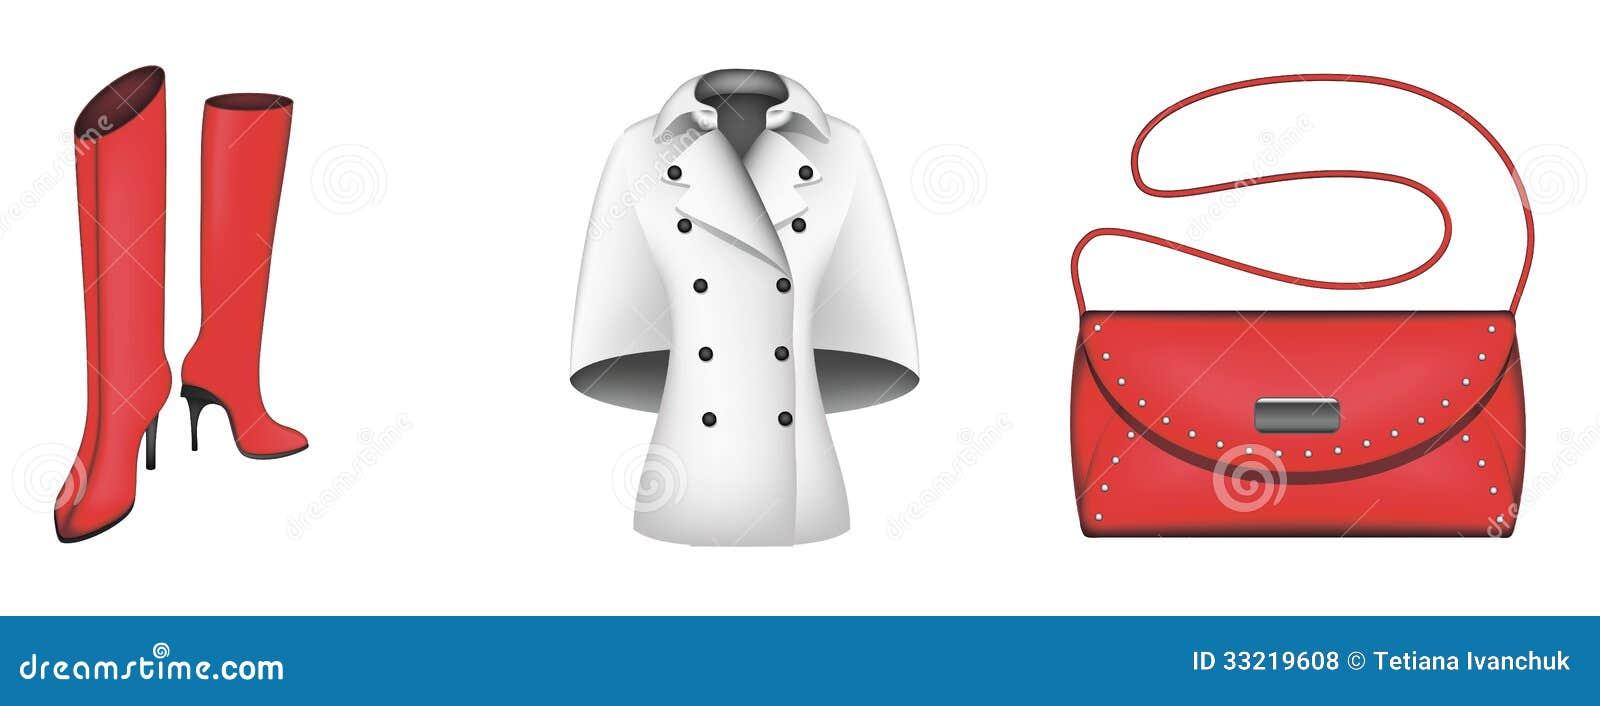 Autumn Icons Boots Coat Handbag Royalty Free Stock Photos Image 33219608